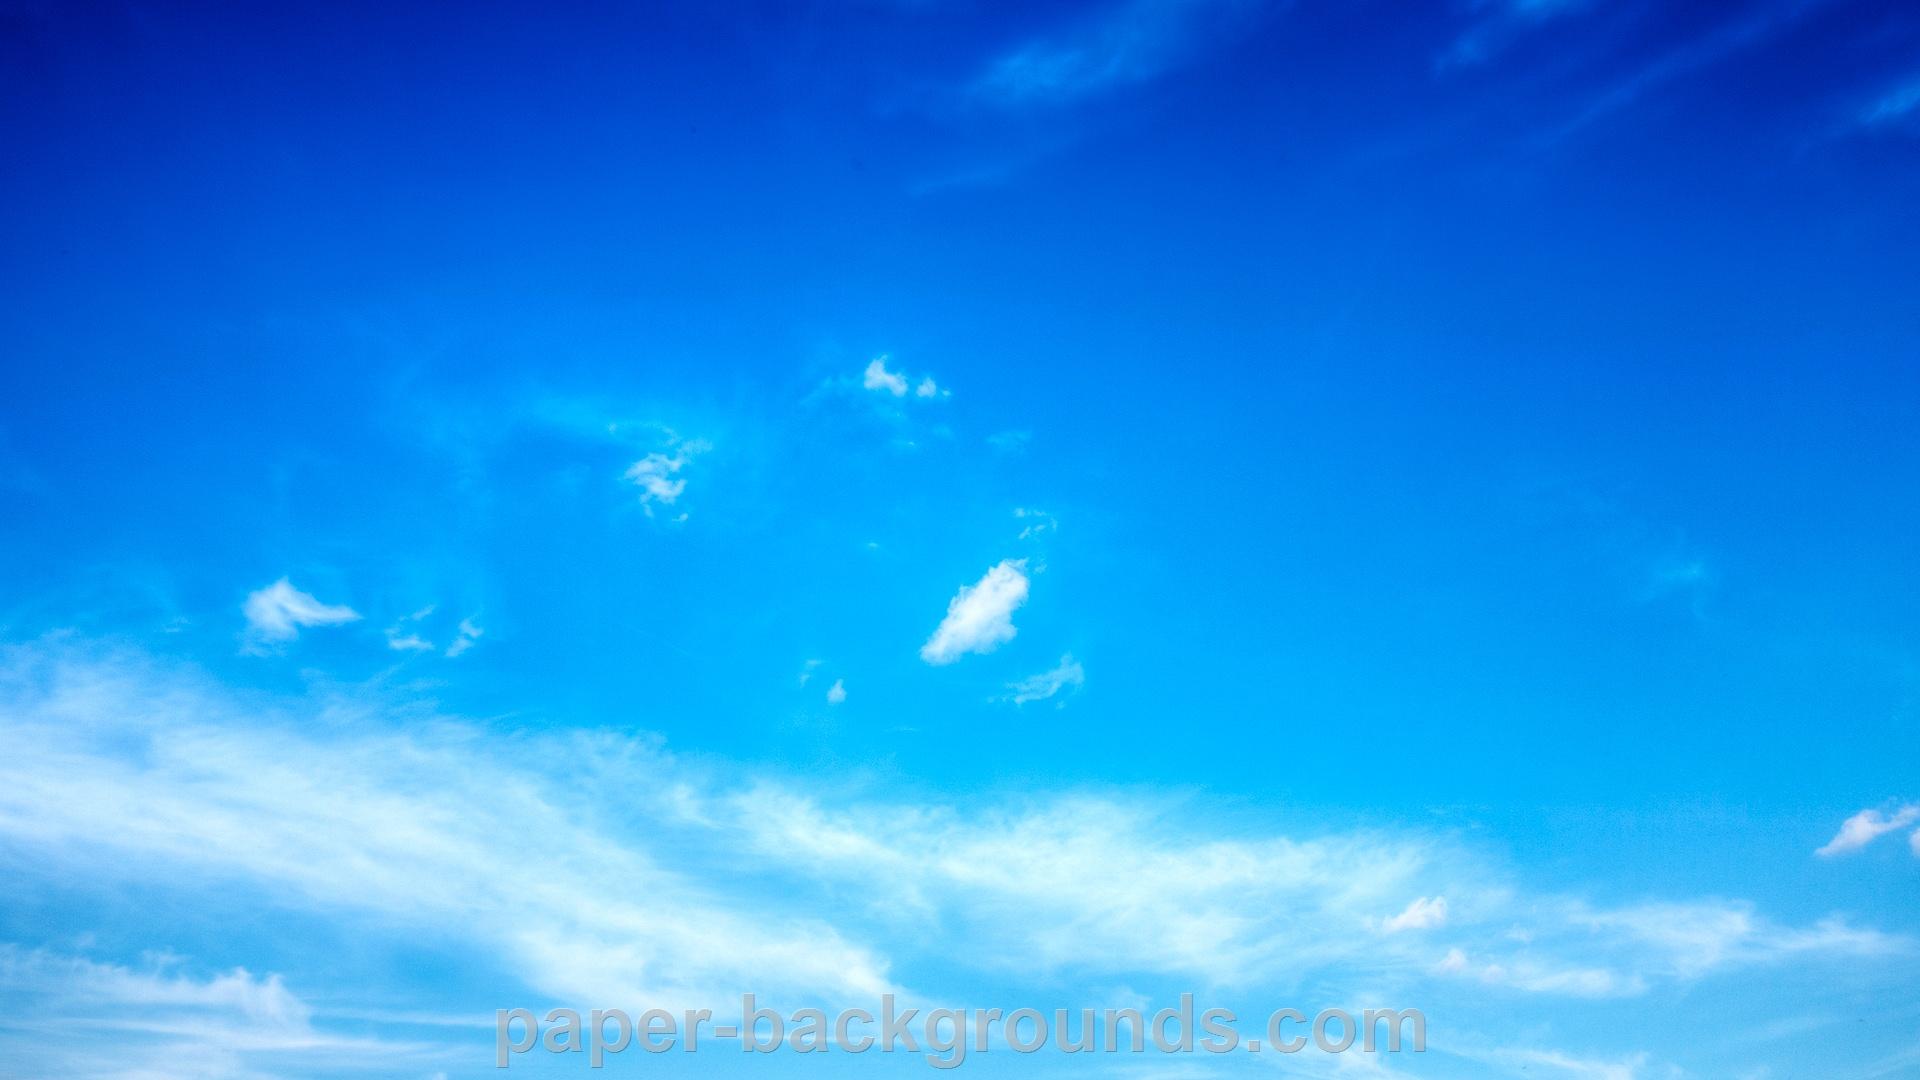 tags blue background sky blue background blue sky date 13 03 12 1920x1080